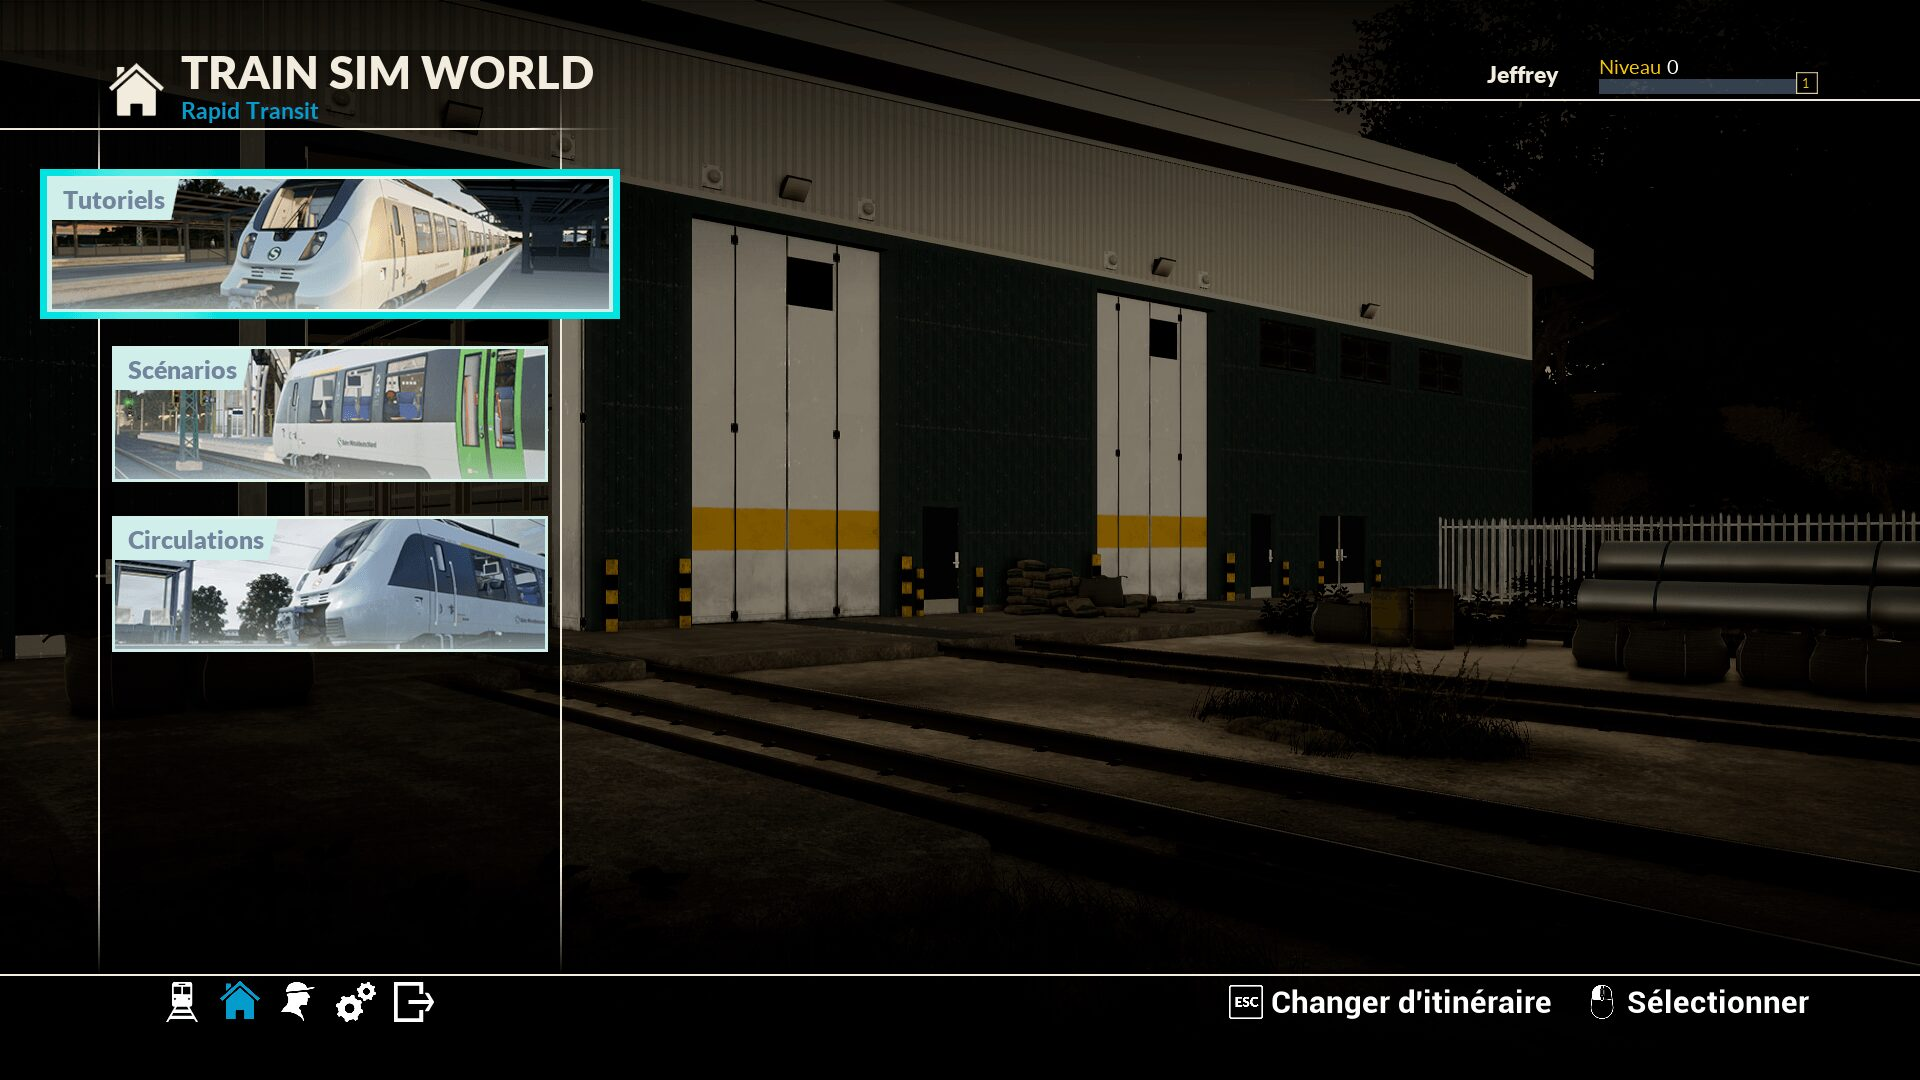 TSW-Rapid Transi-tuto